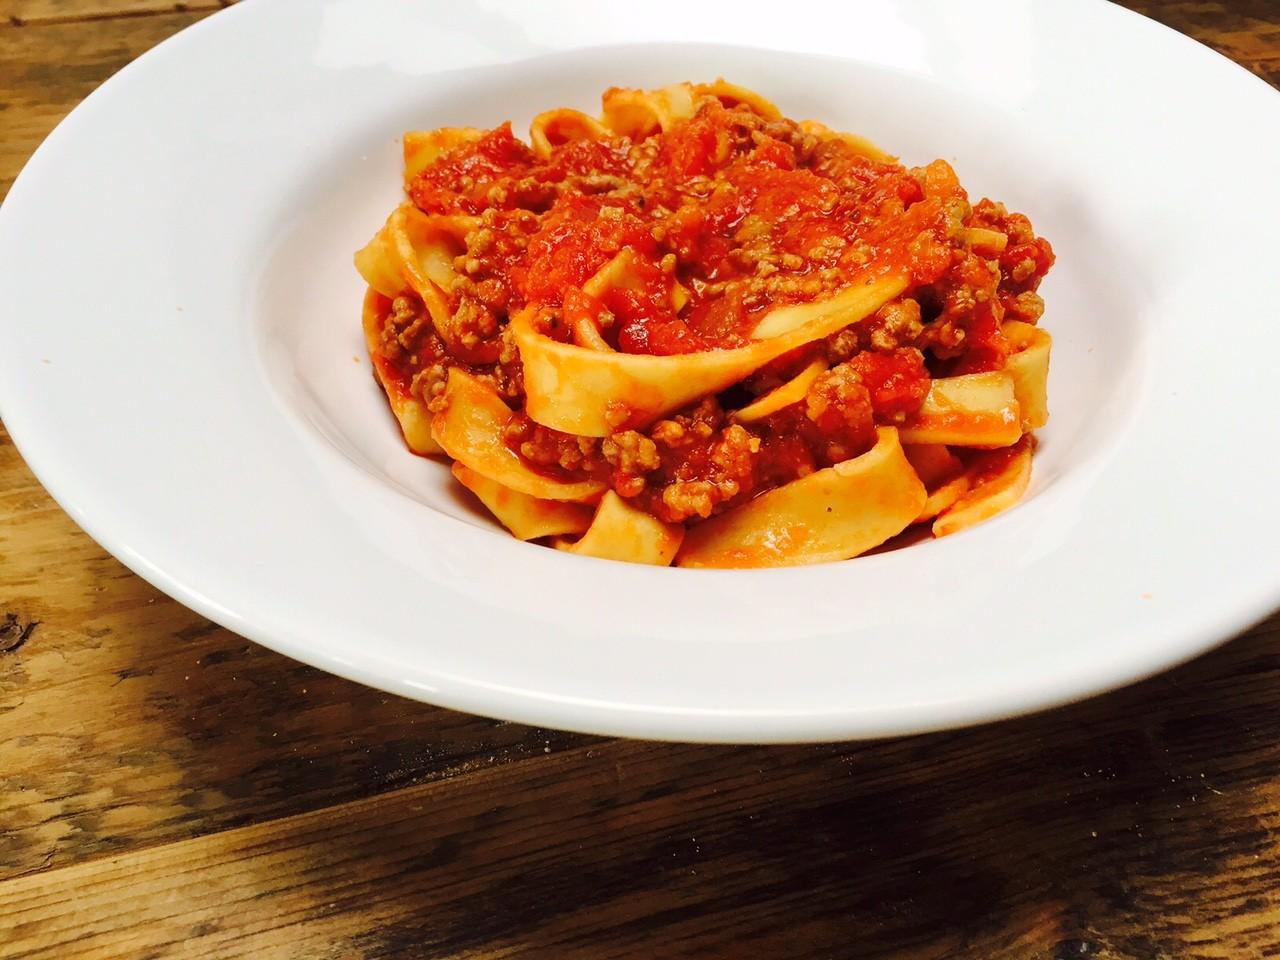 Snelle pasta bolognaise zelf maken als 20 minuten recept van Foodblog foodinista